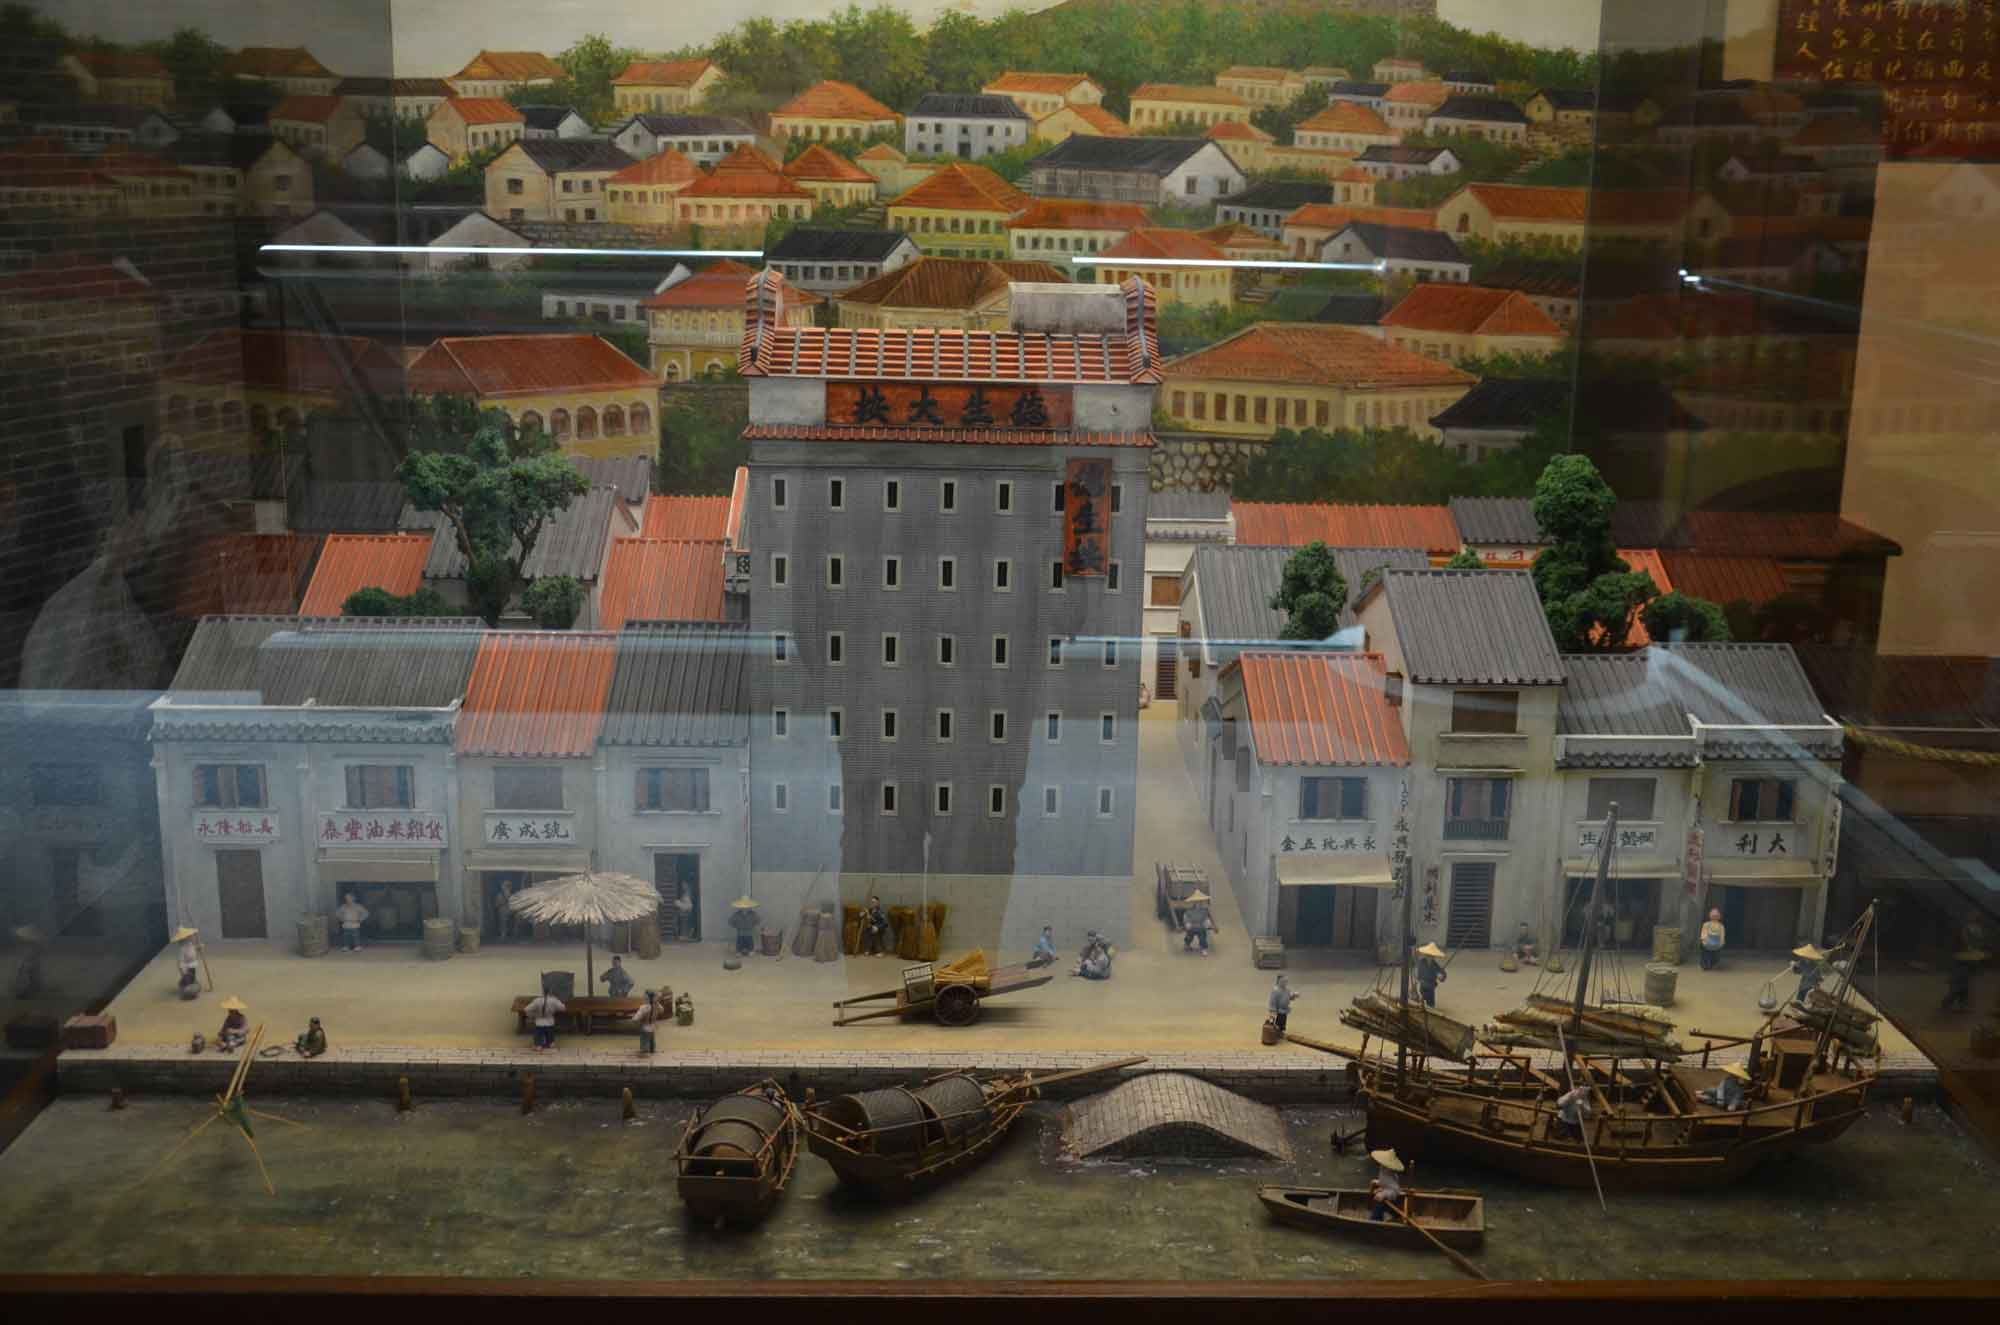 Macau Museum pawn shop